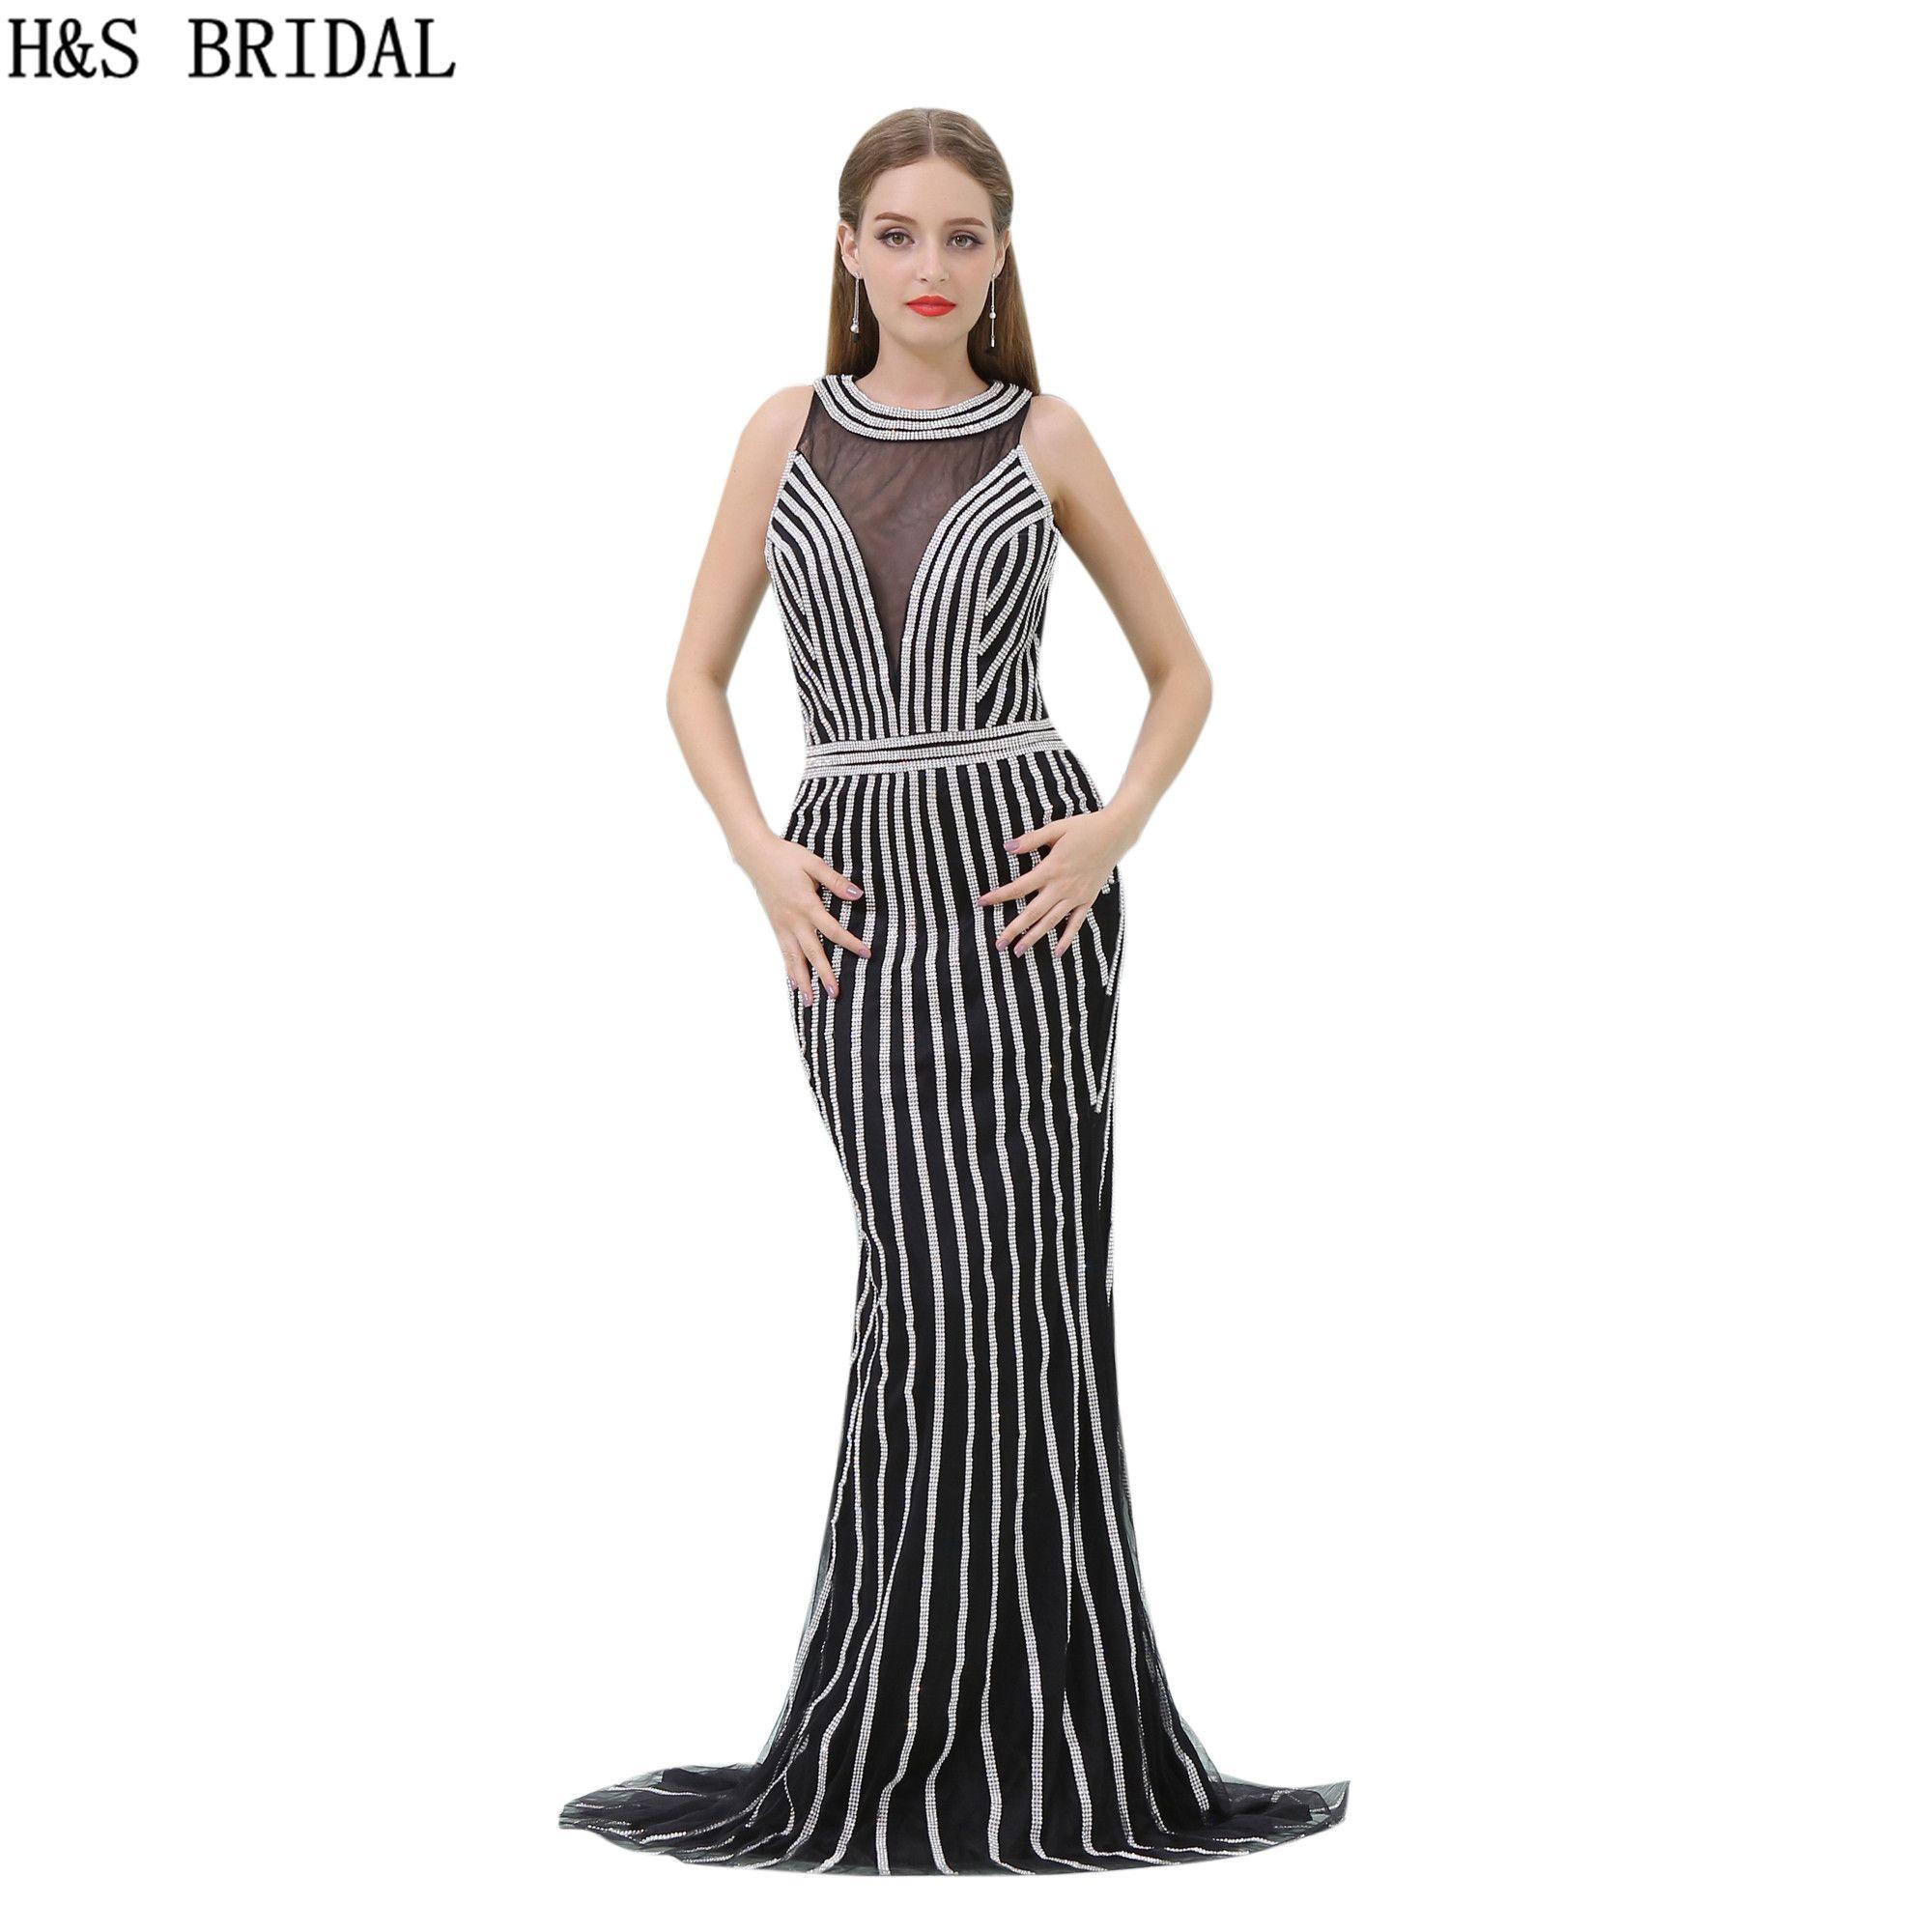 Silver Beaded Black Evening Dress Luxury Shinny Crystals Long Mermaid Sheer  Neck Women Formal Evening Party Gowns New B017 Grey Evening Dress Long  Occasion ... 4fe6af54ac38